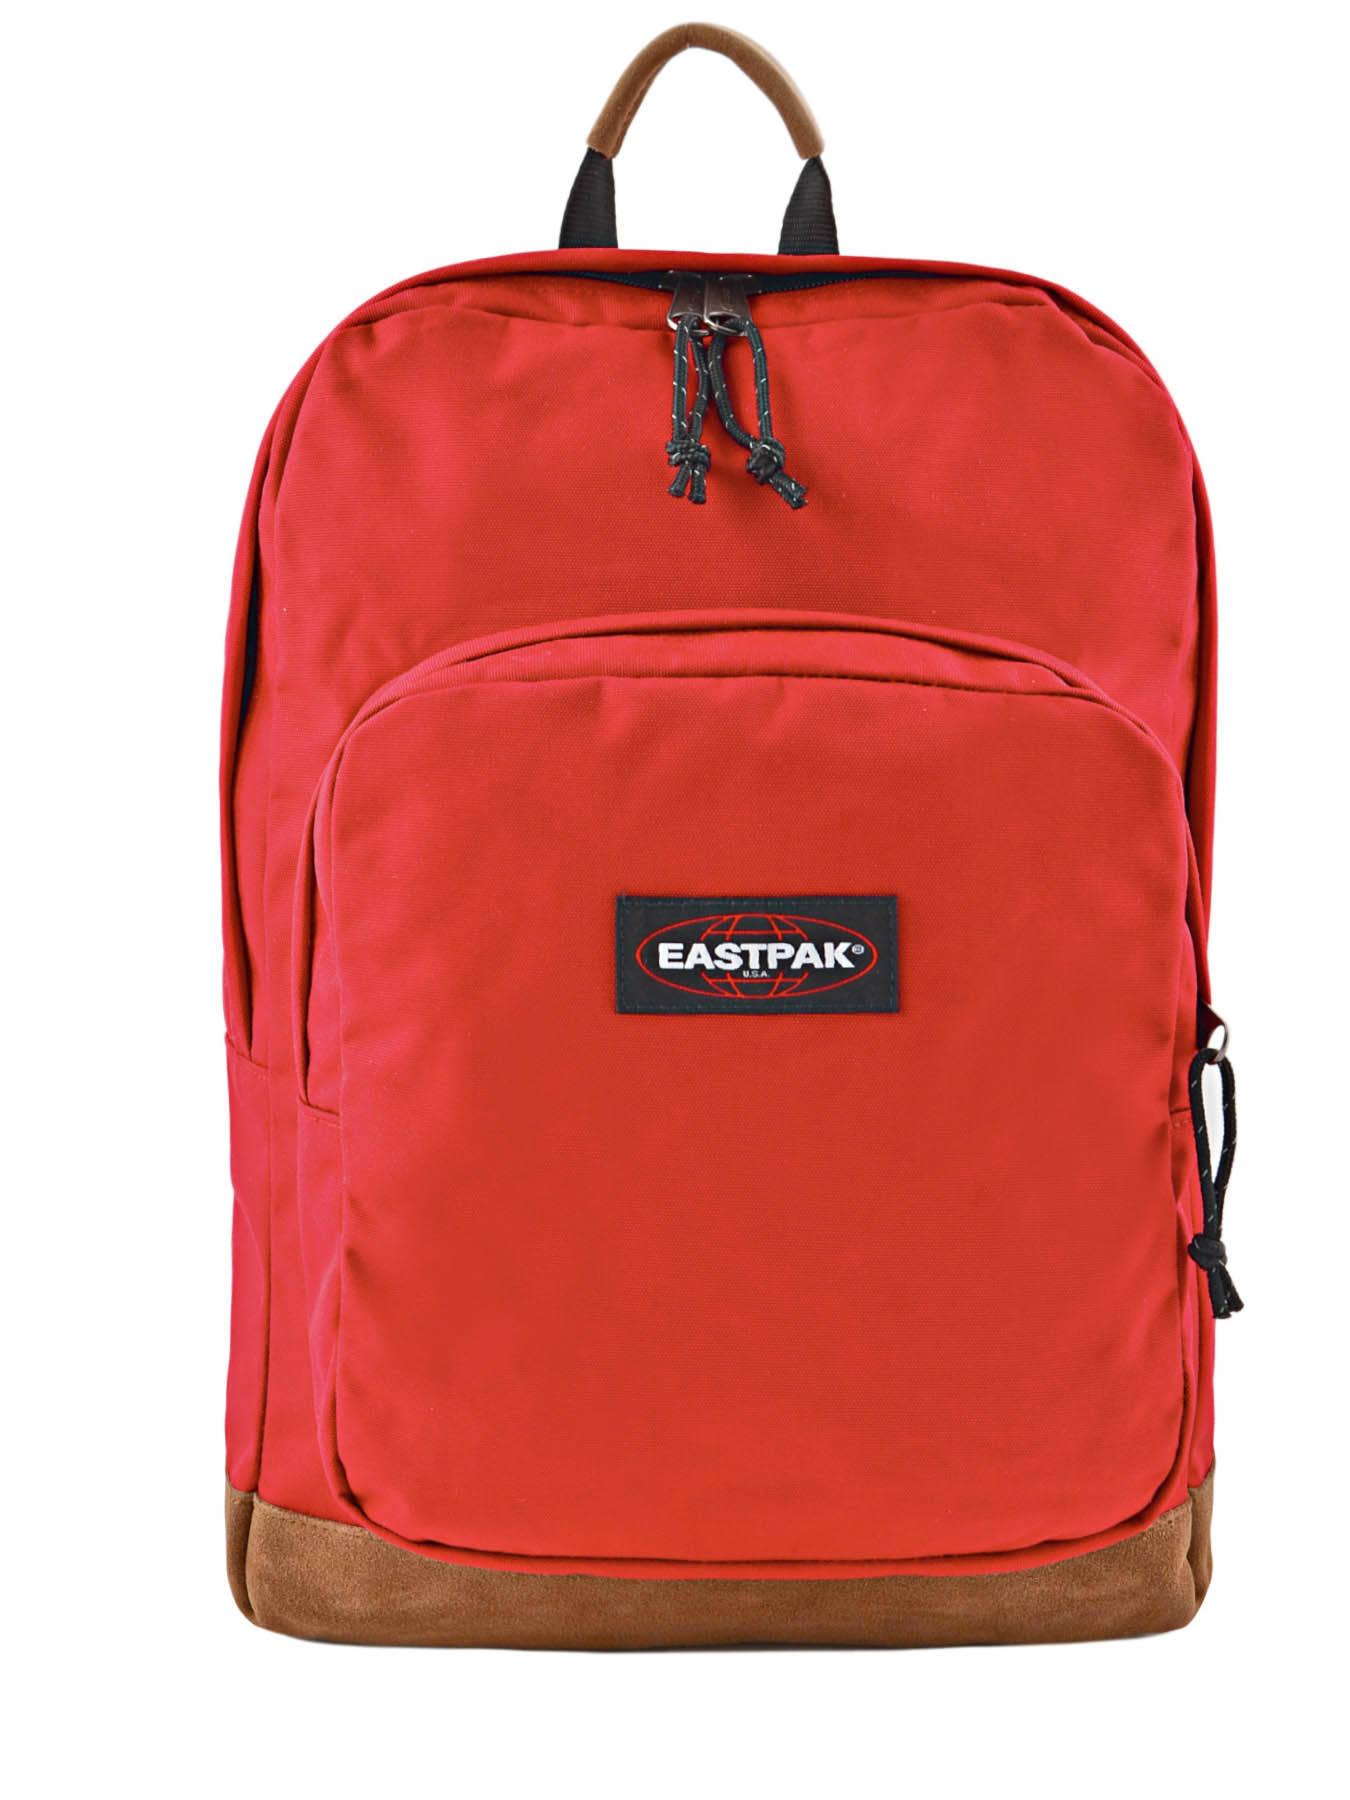 Sac à dos Eastpak Egghead | Sac à dos ordinateur Eastpak